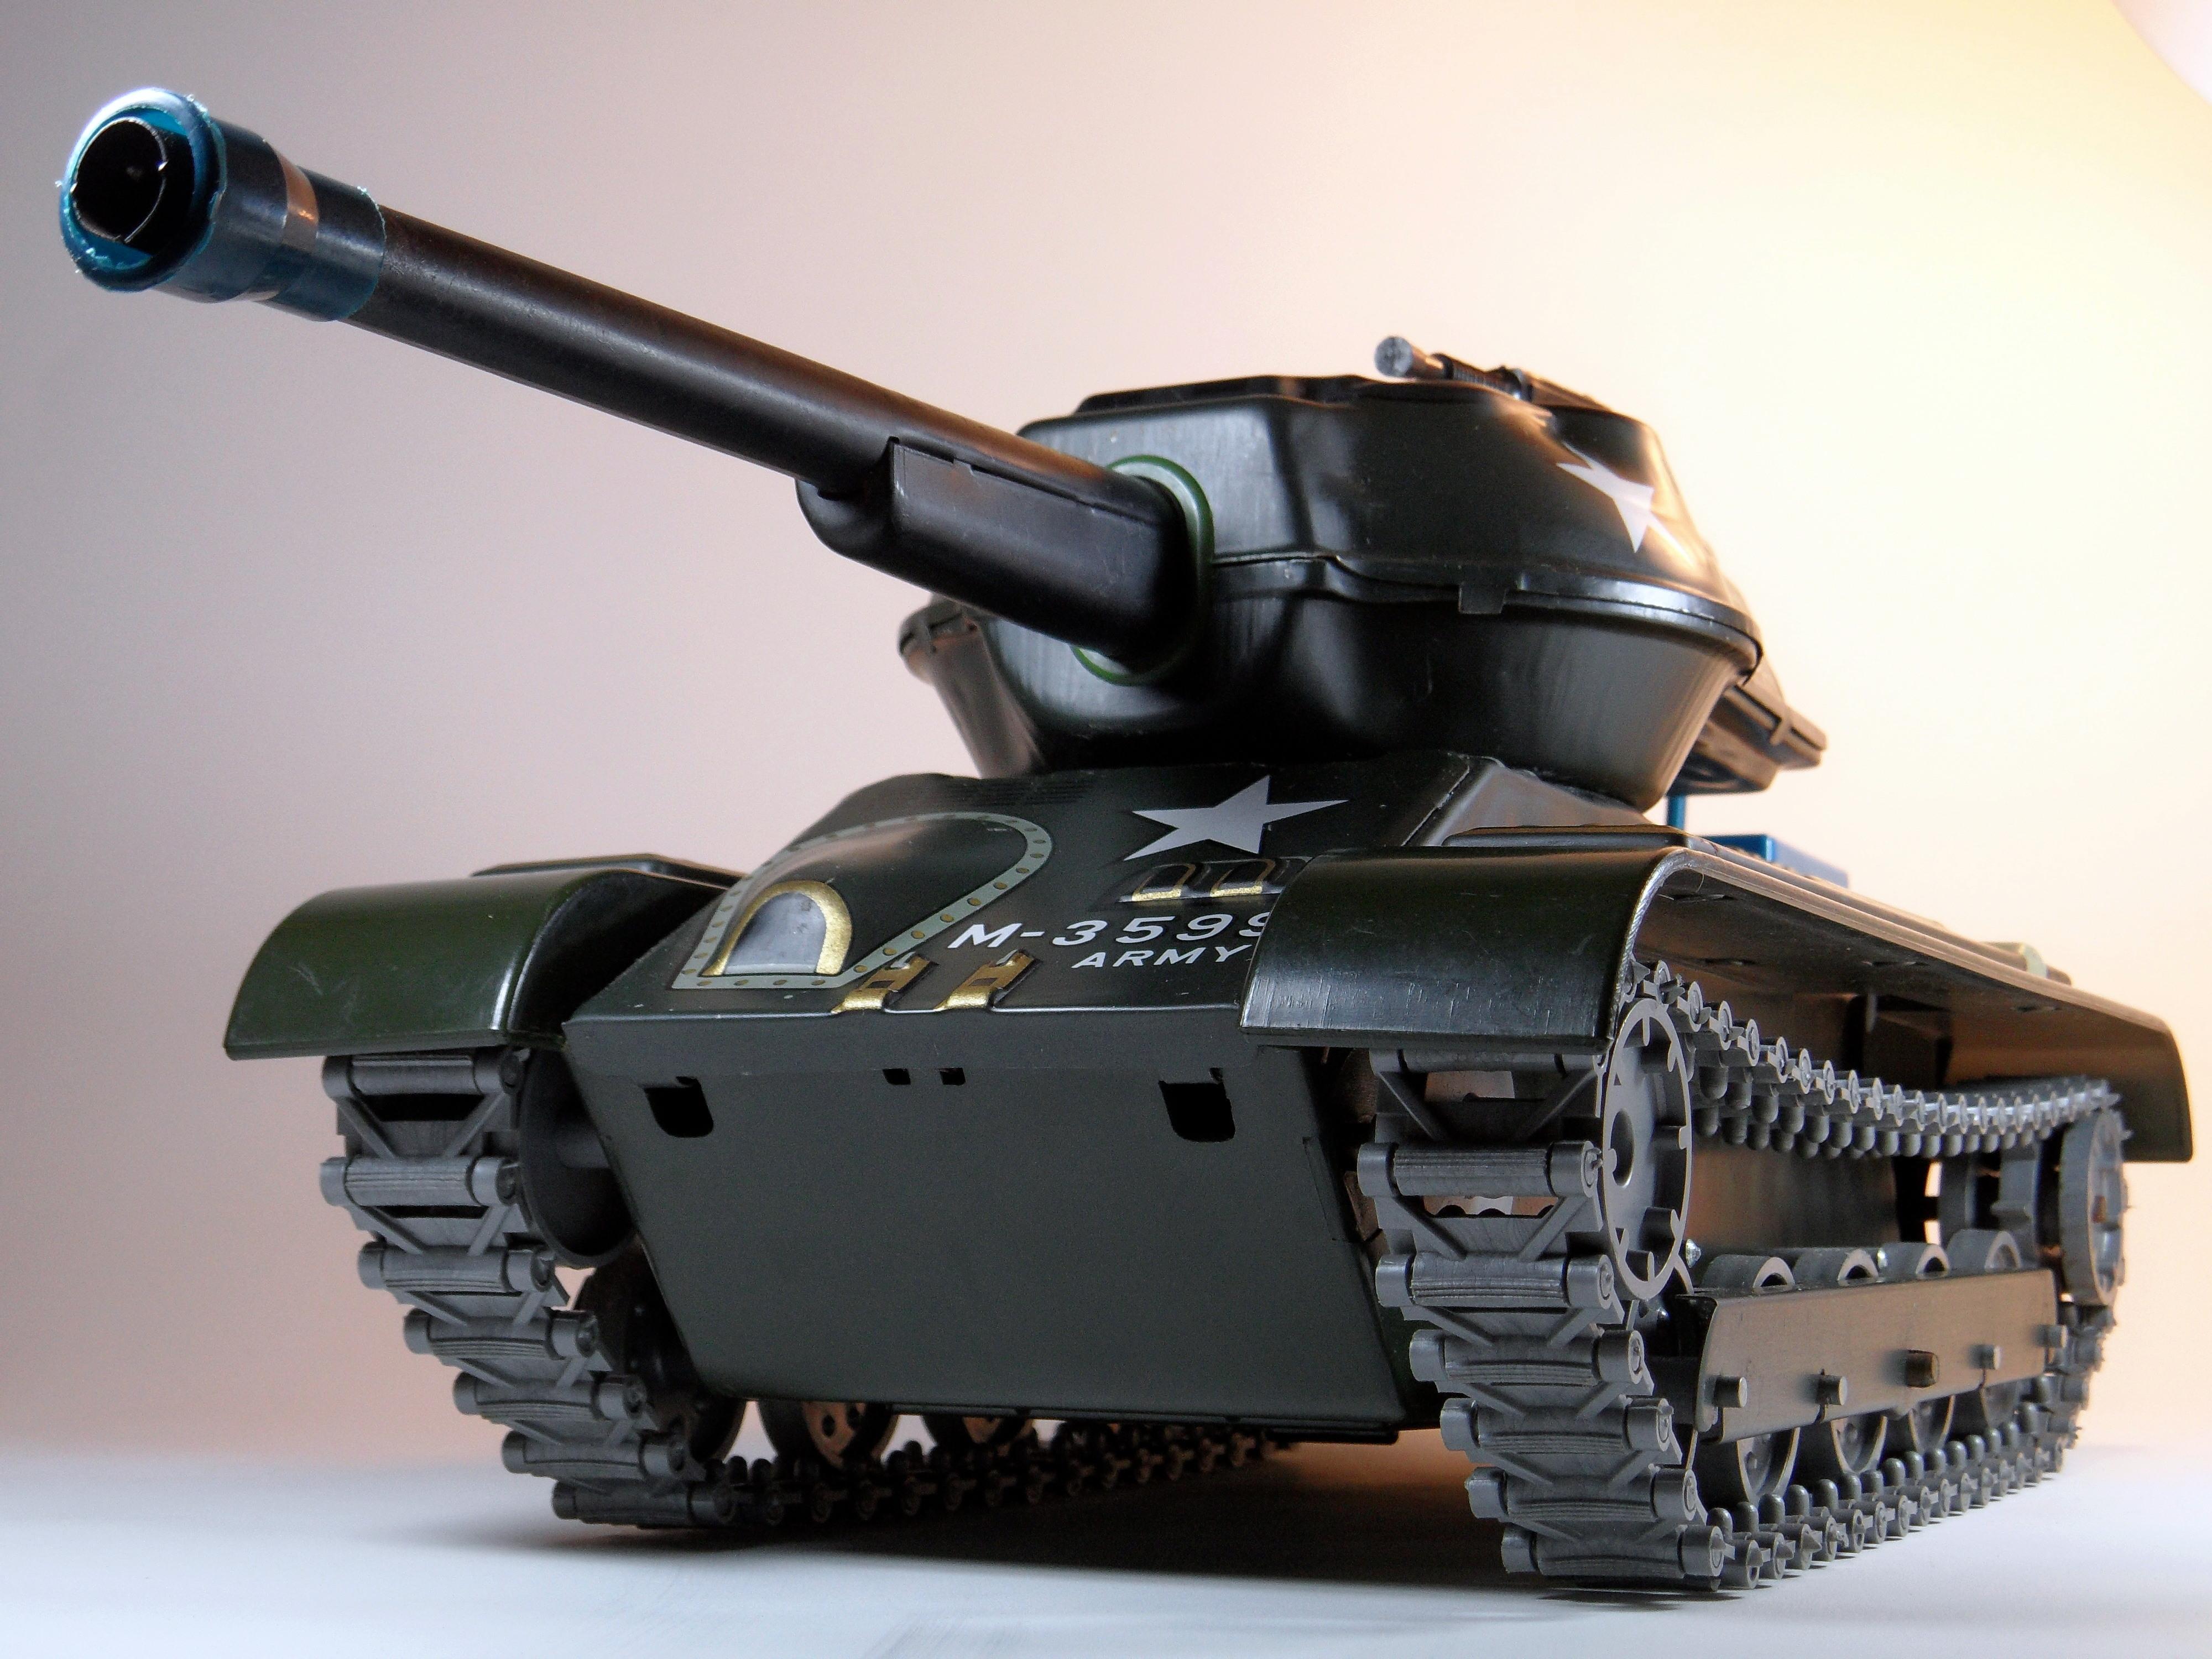 File:Masudaya Battery Powered Army Tank M-99 Tin Toy ...